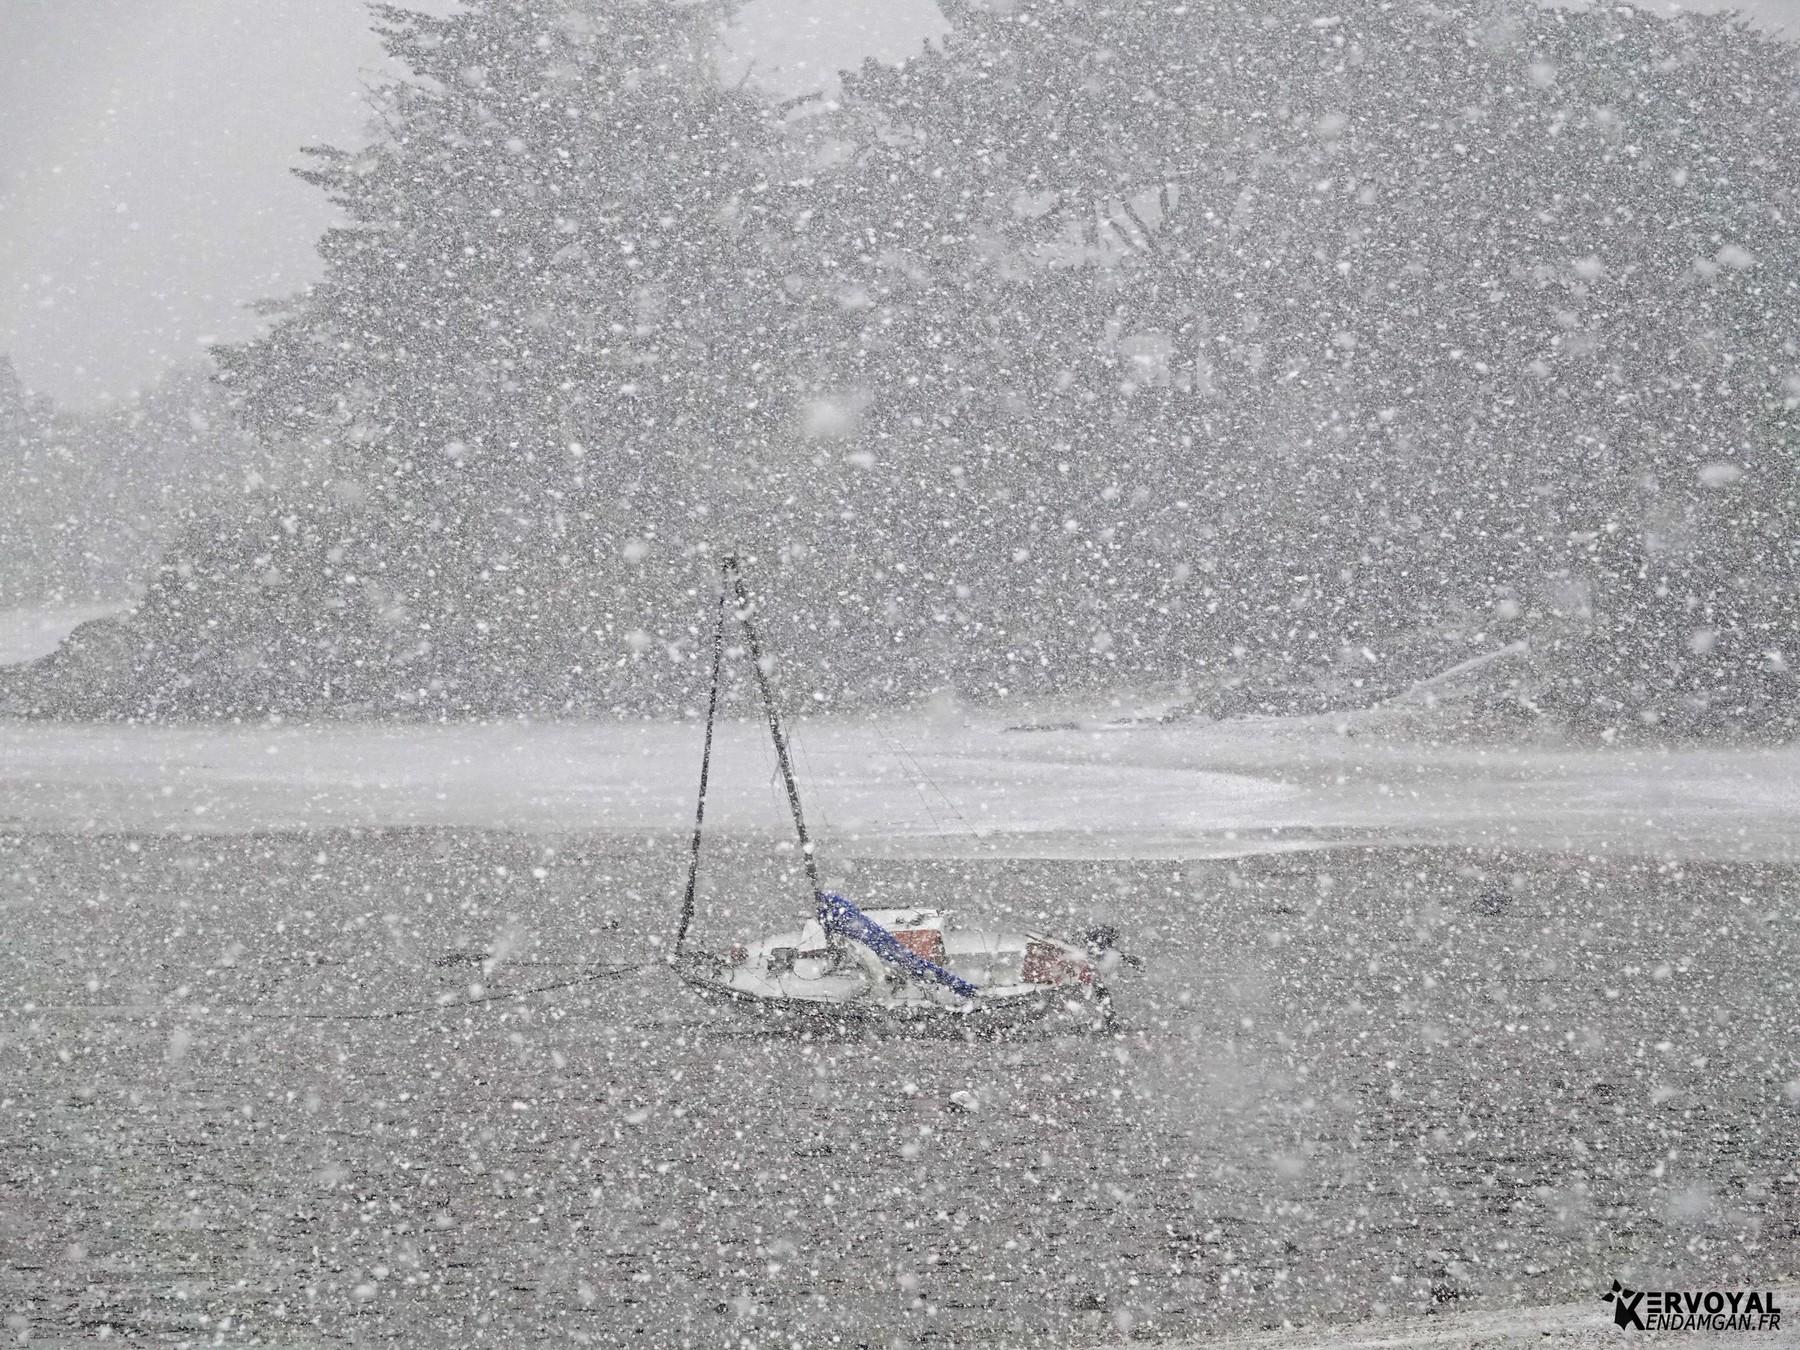 neige à kervoyal 11 février 2021 damgan morbihan (19)